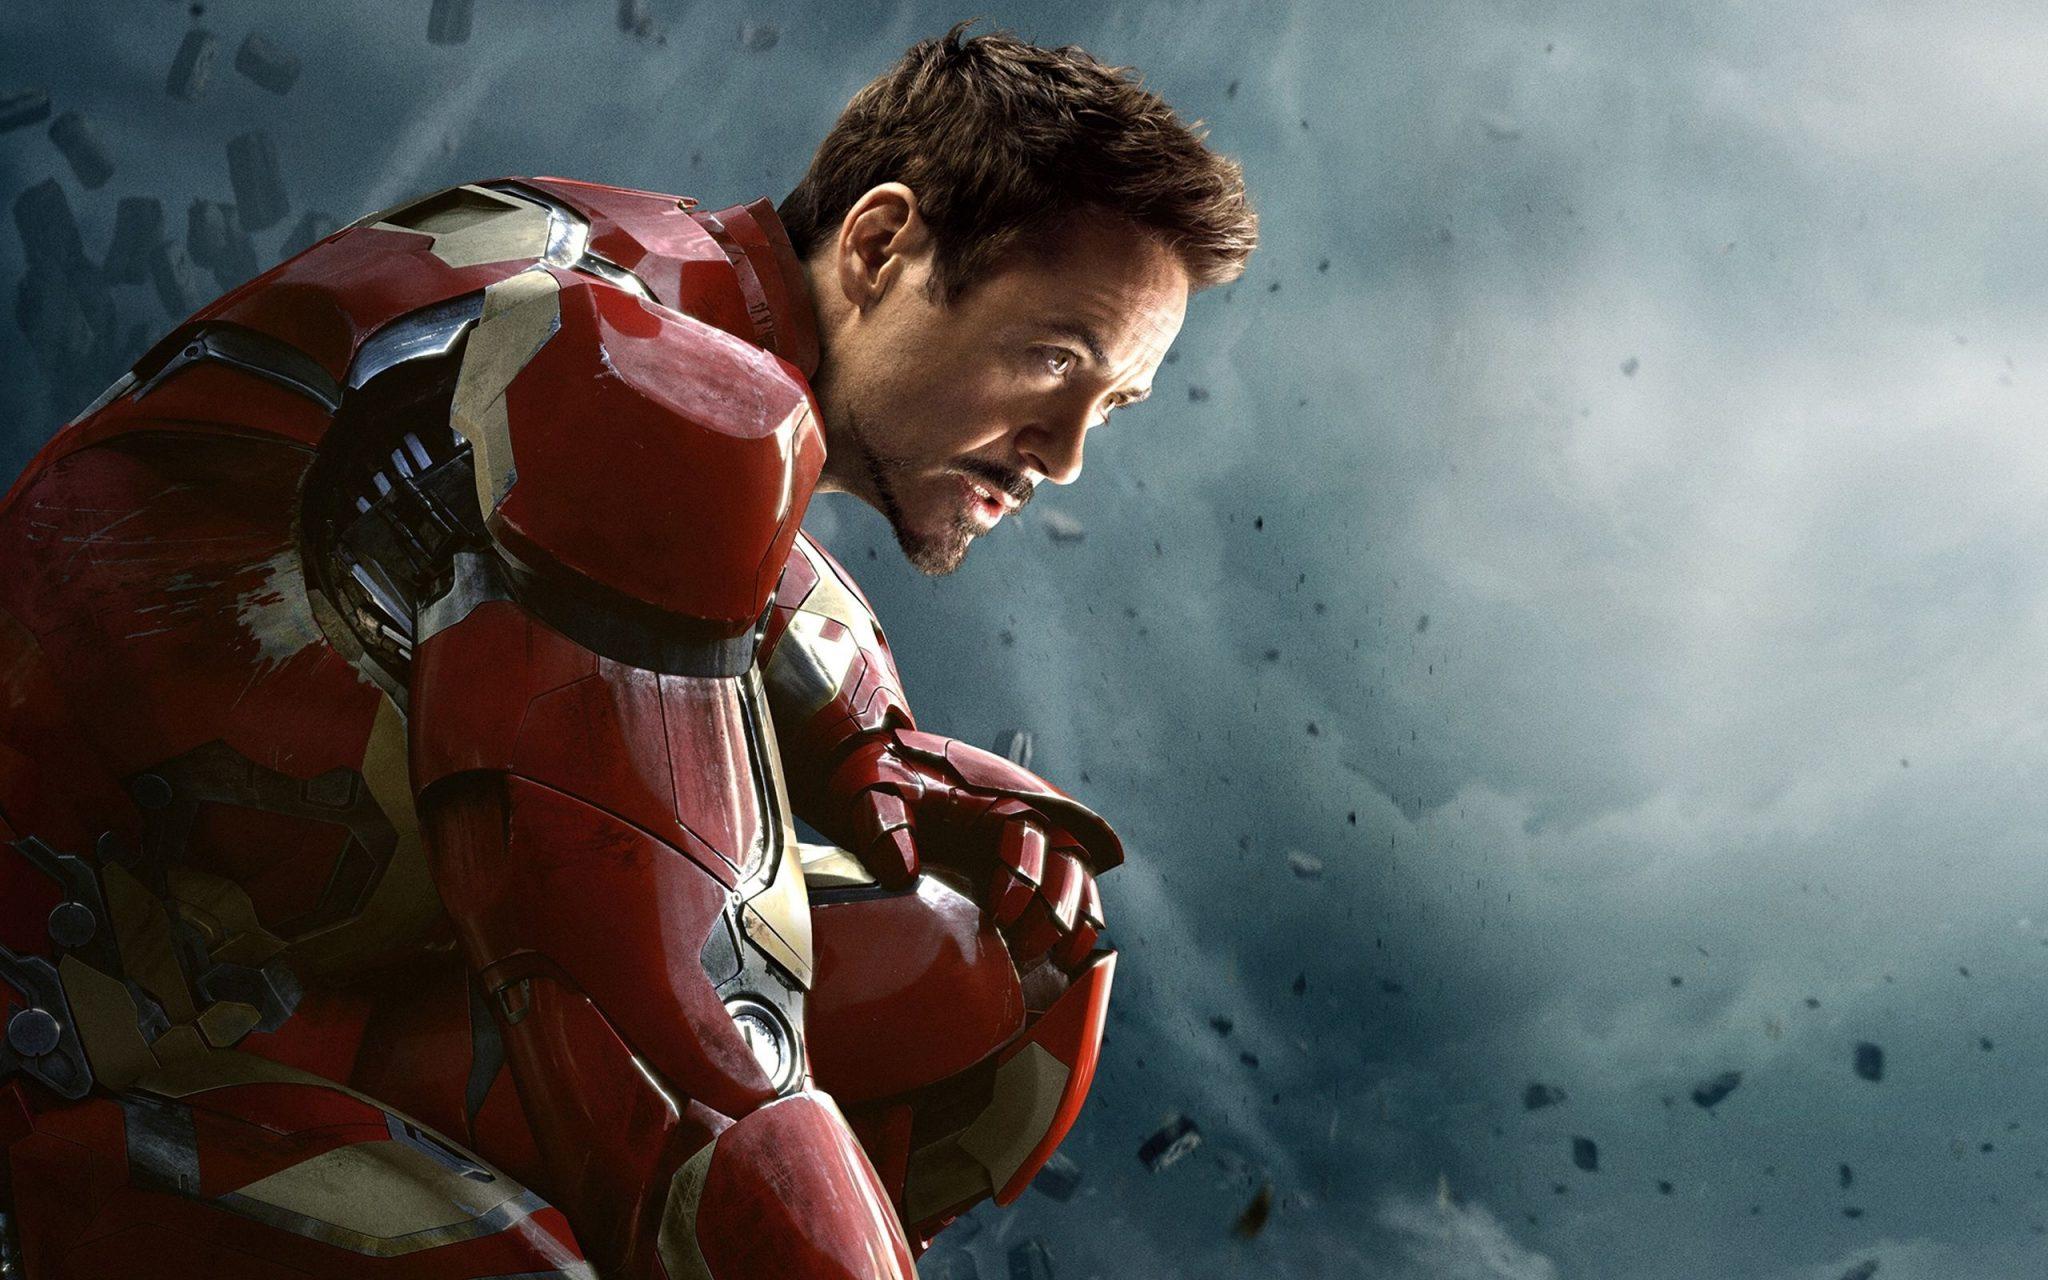 captain-america-thor-iron-man-anh-sieu-anh-hung